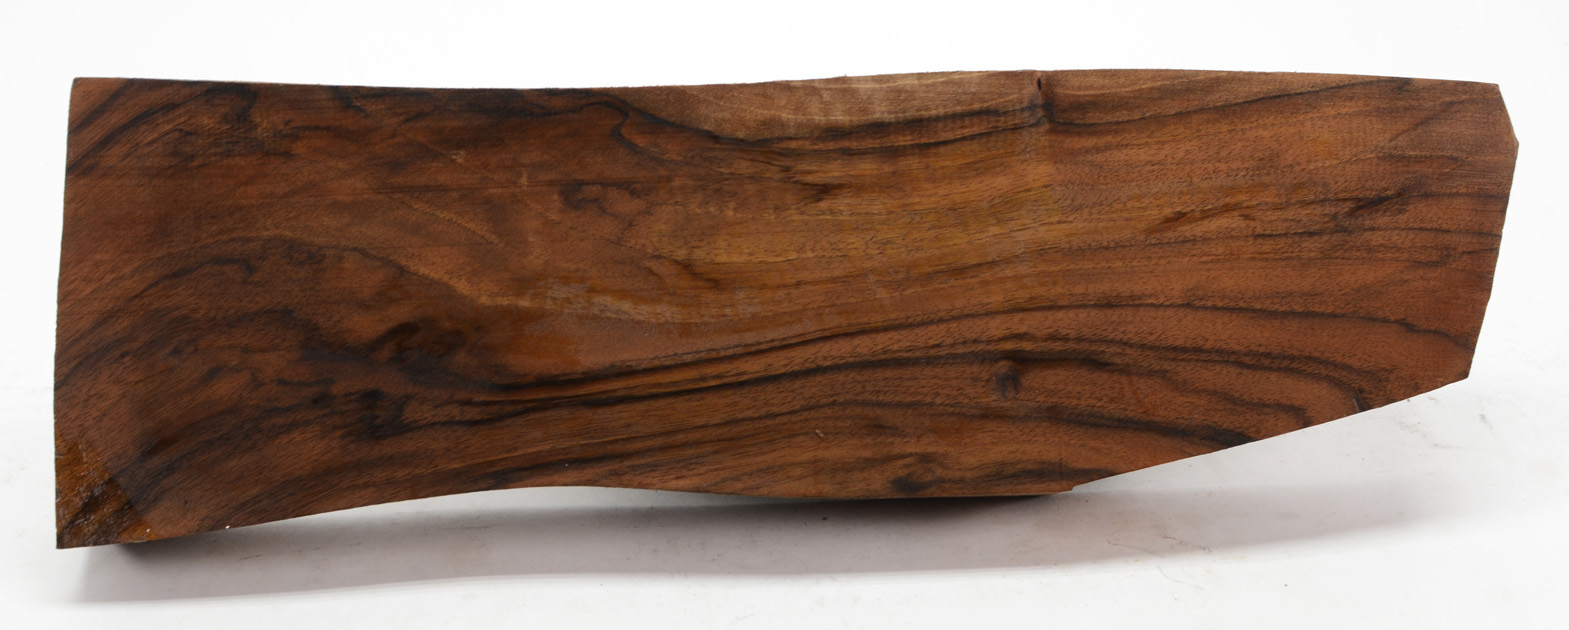 English Walnut Wood Butt Stock Blank